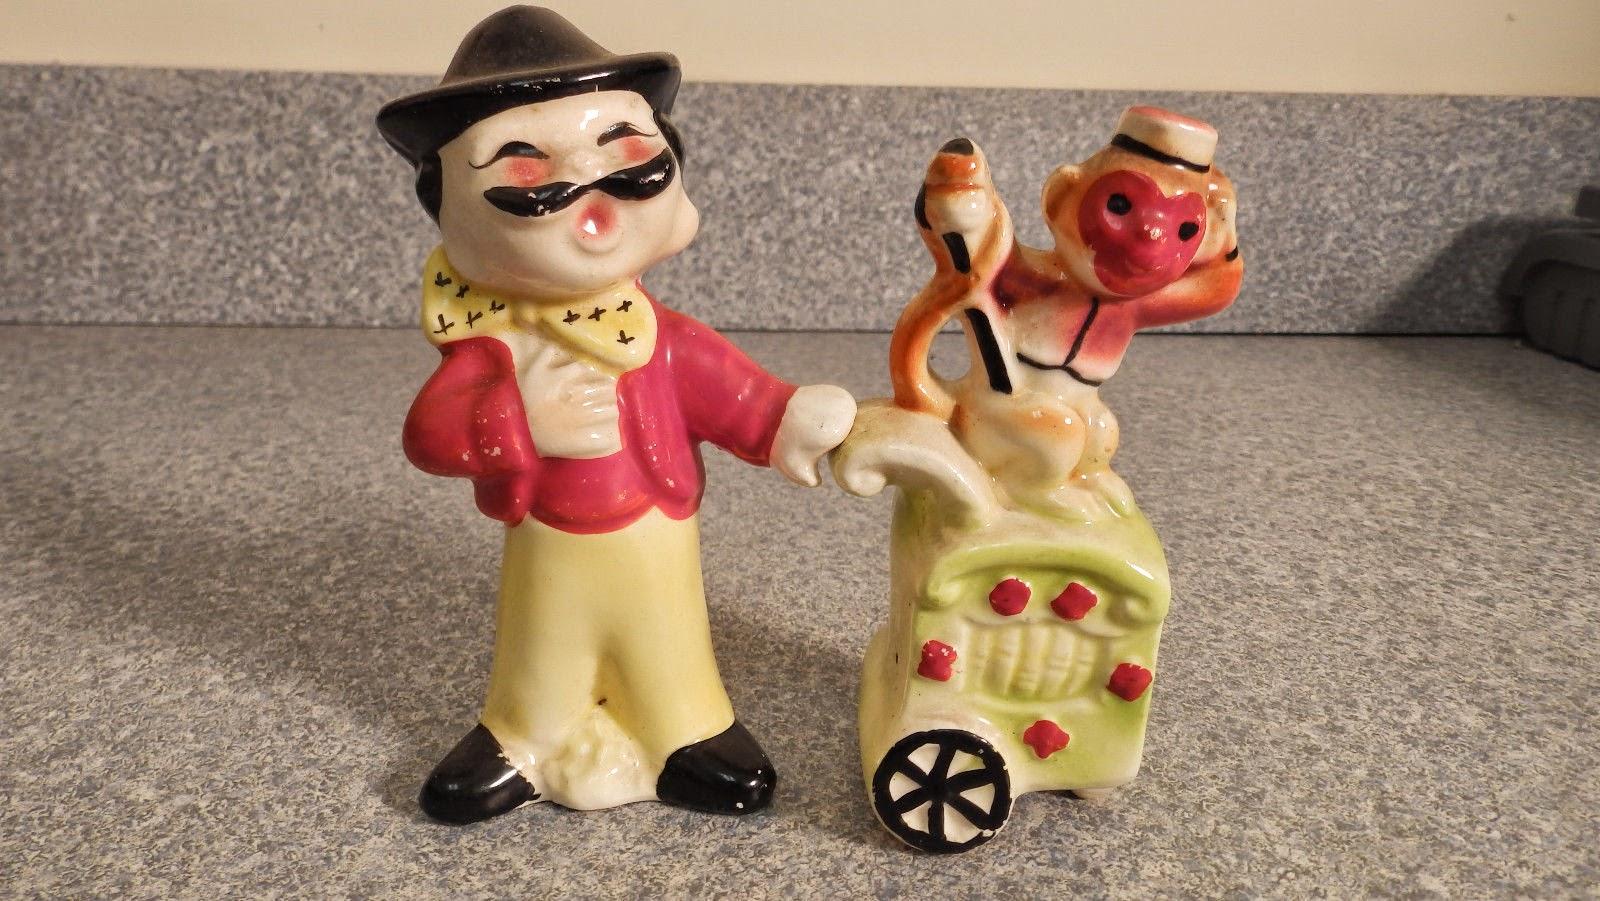 http://www.ebay.com/itm/vintage-salt-pepper-shaker-Organ-Grinder-and-Monkey-/321689588053?pt=LH_DefaultDomain_0&hash=item4ae6319155